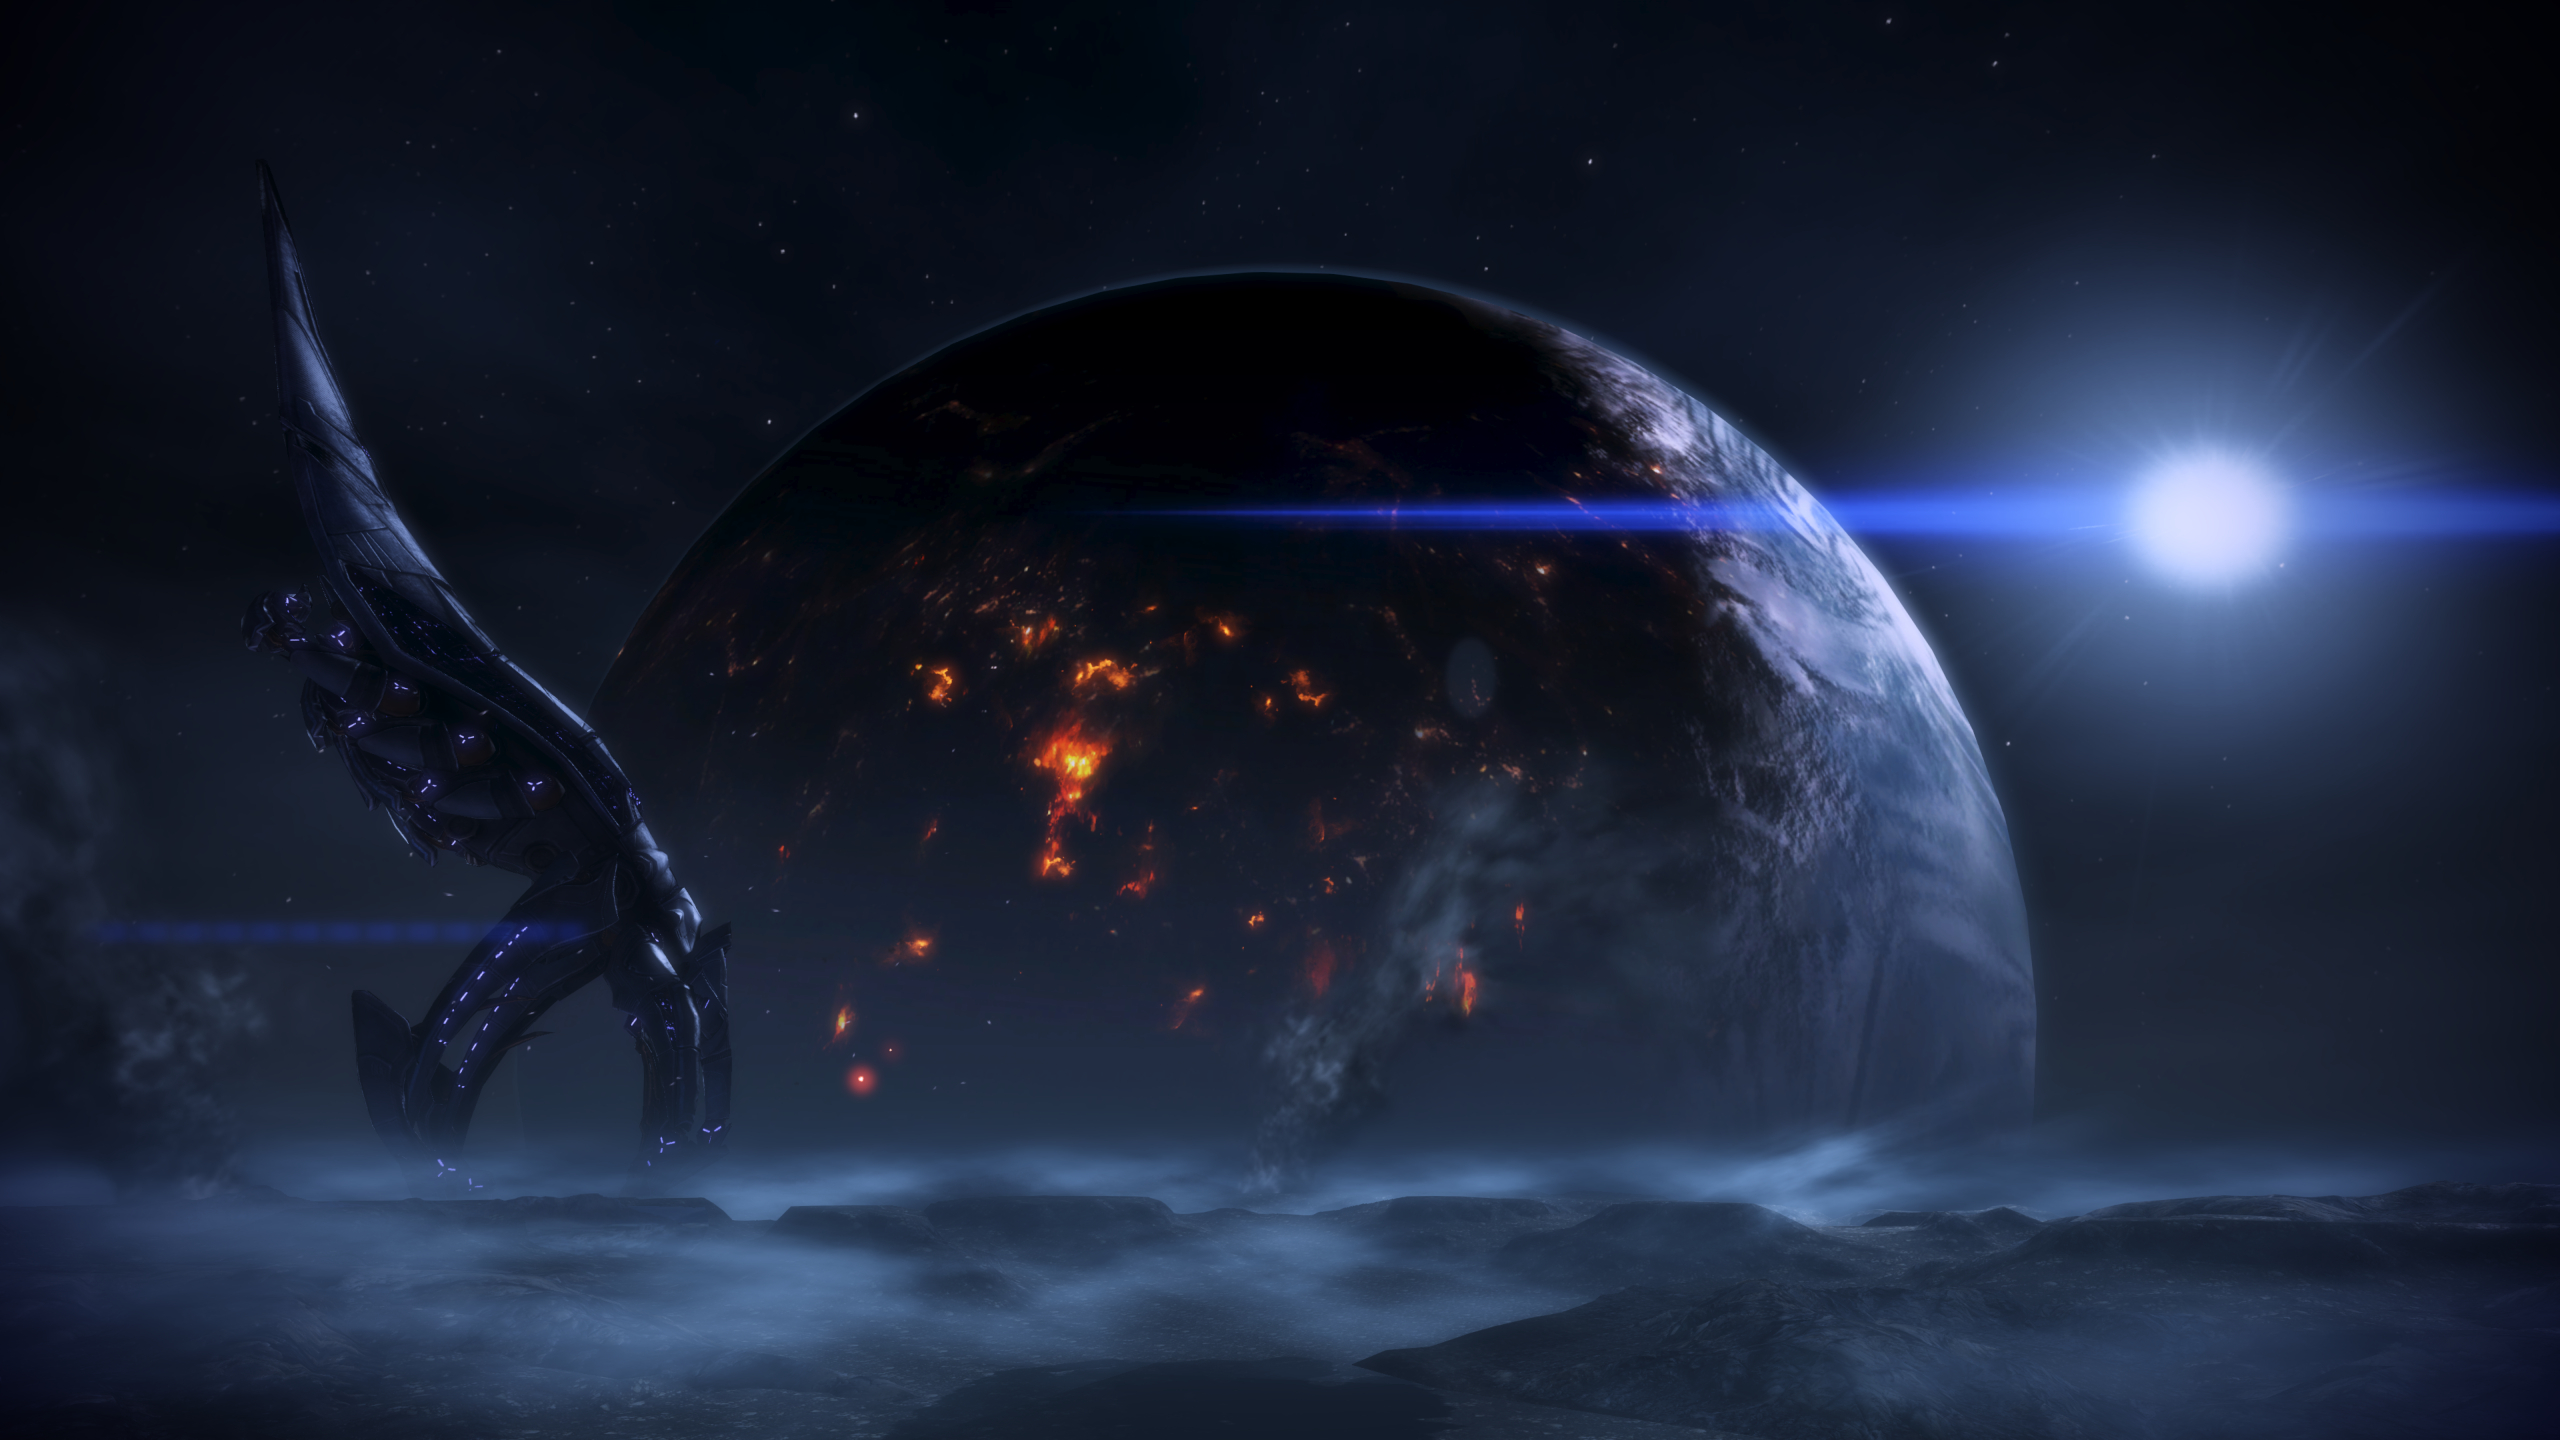 344 Mass Effect 3 HD Wallpapers | Backgrounds - Wallpaper Abyss